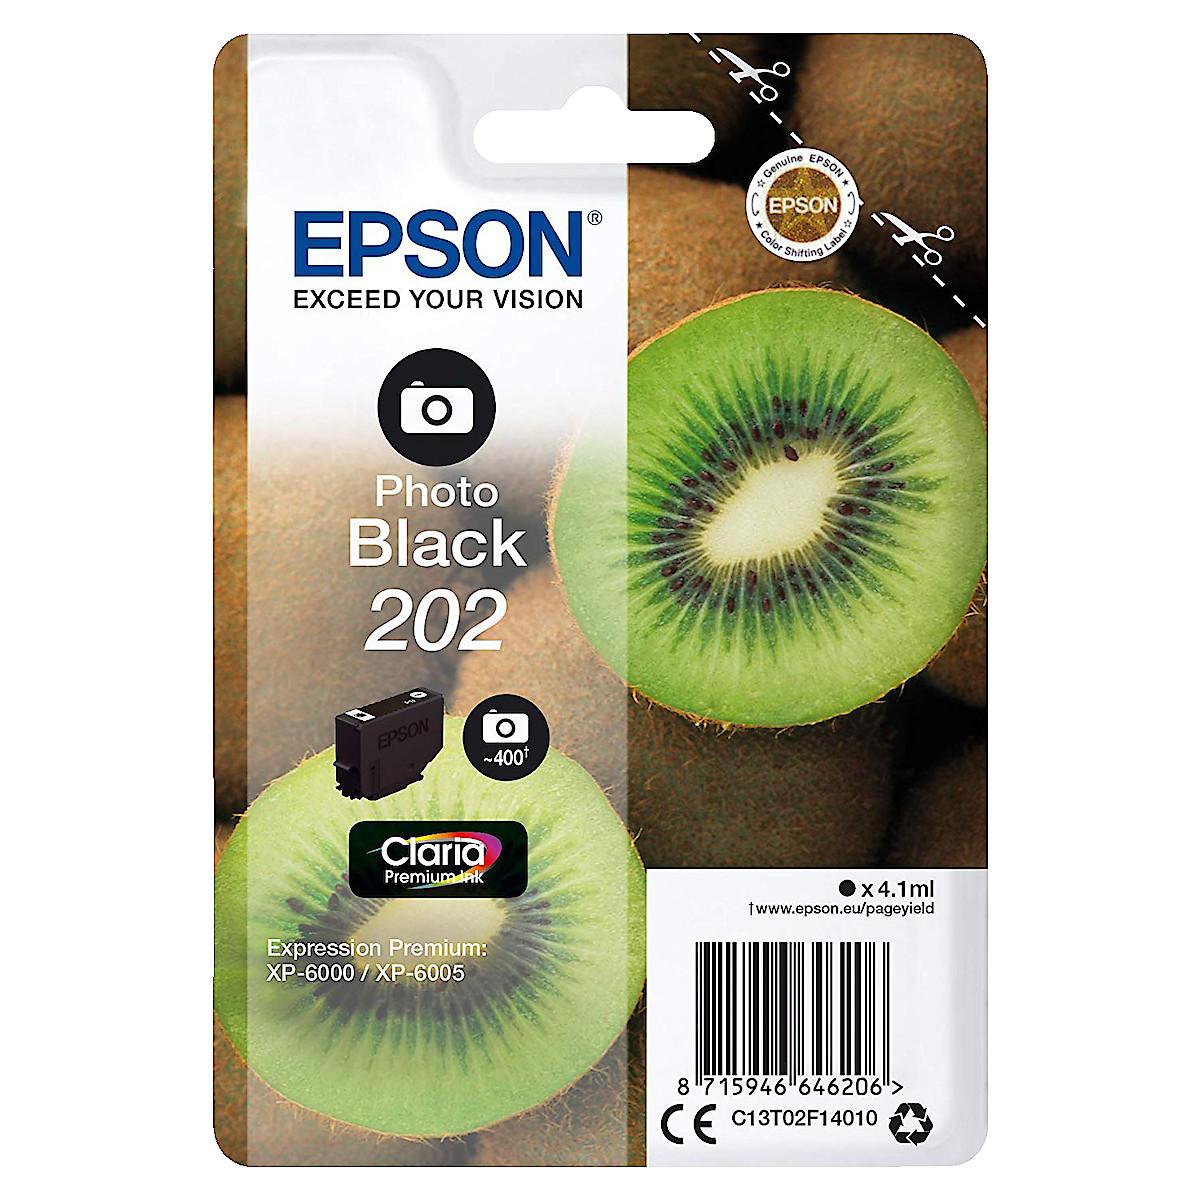 Bläckpatron Epson 202